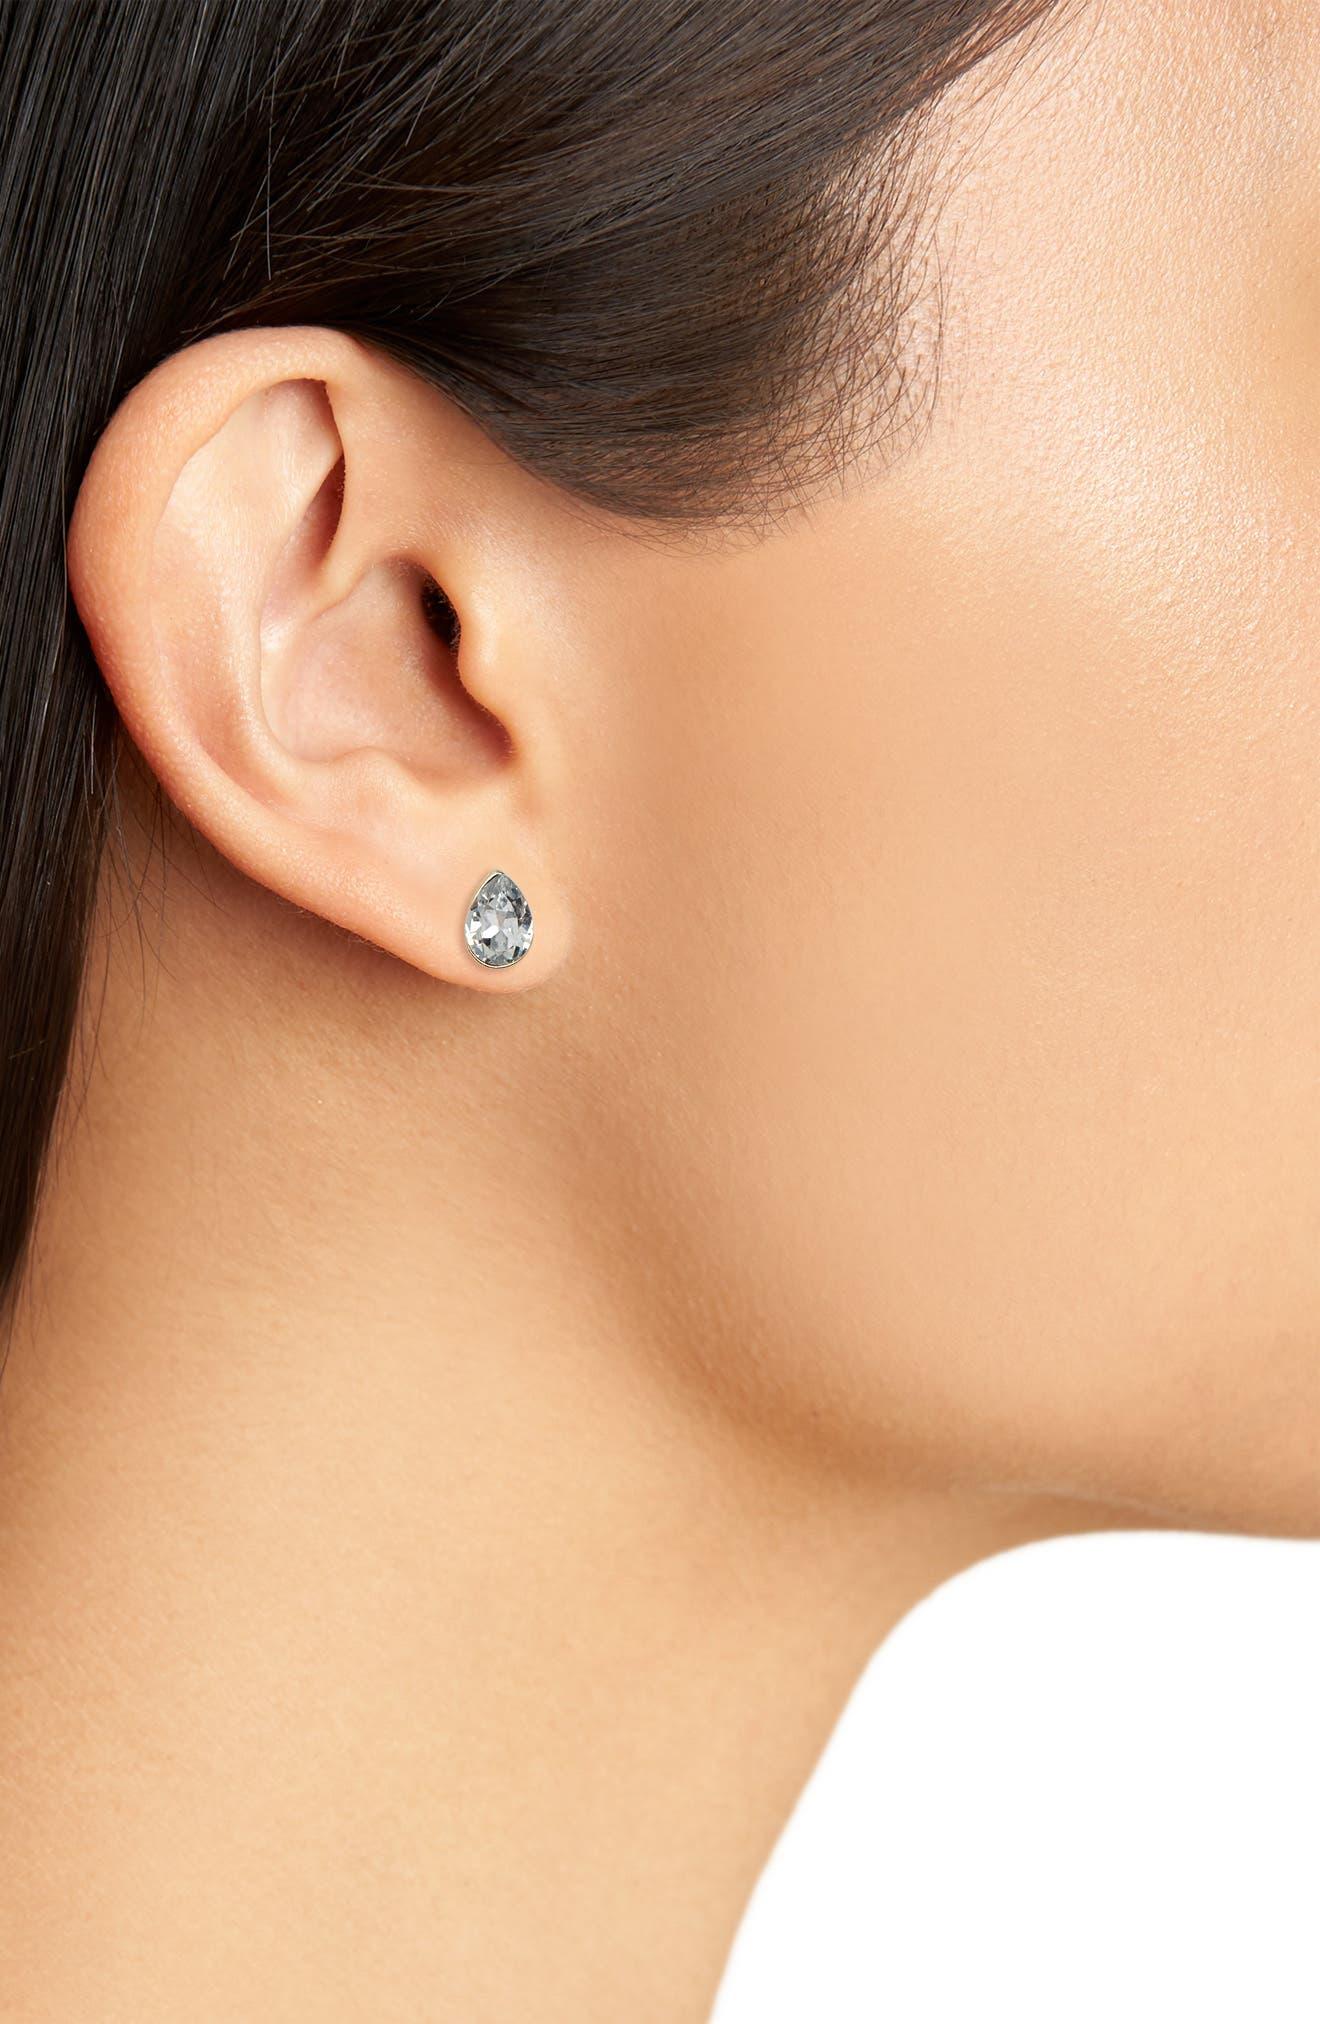 Set of 6 Moon & Star Stud Earrings,                             Alternate thumbnail 2, color,                             710